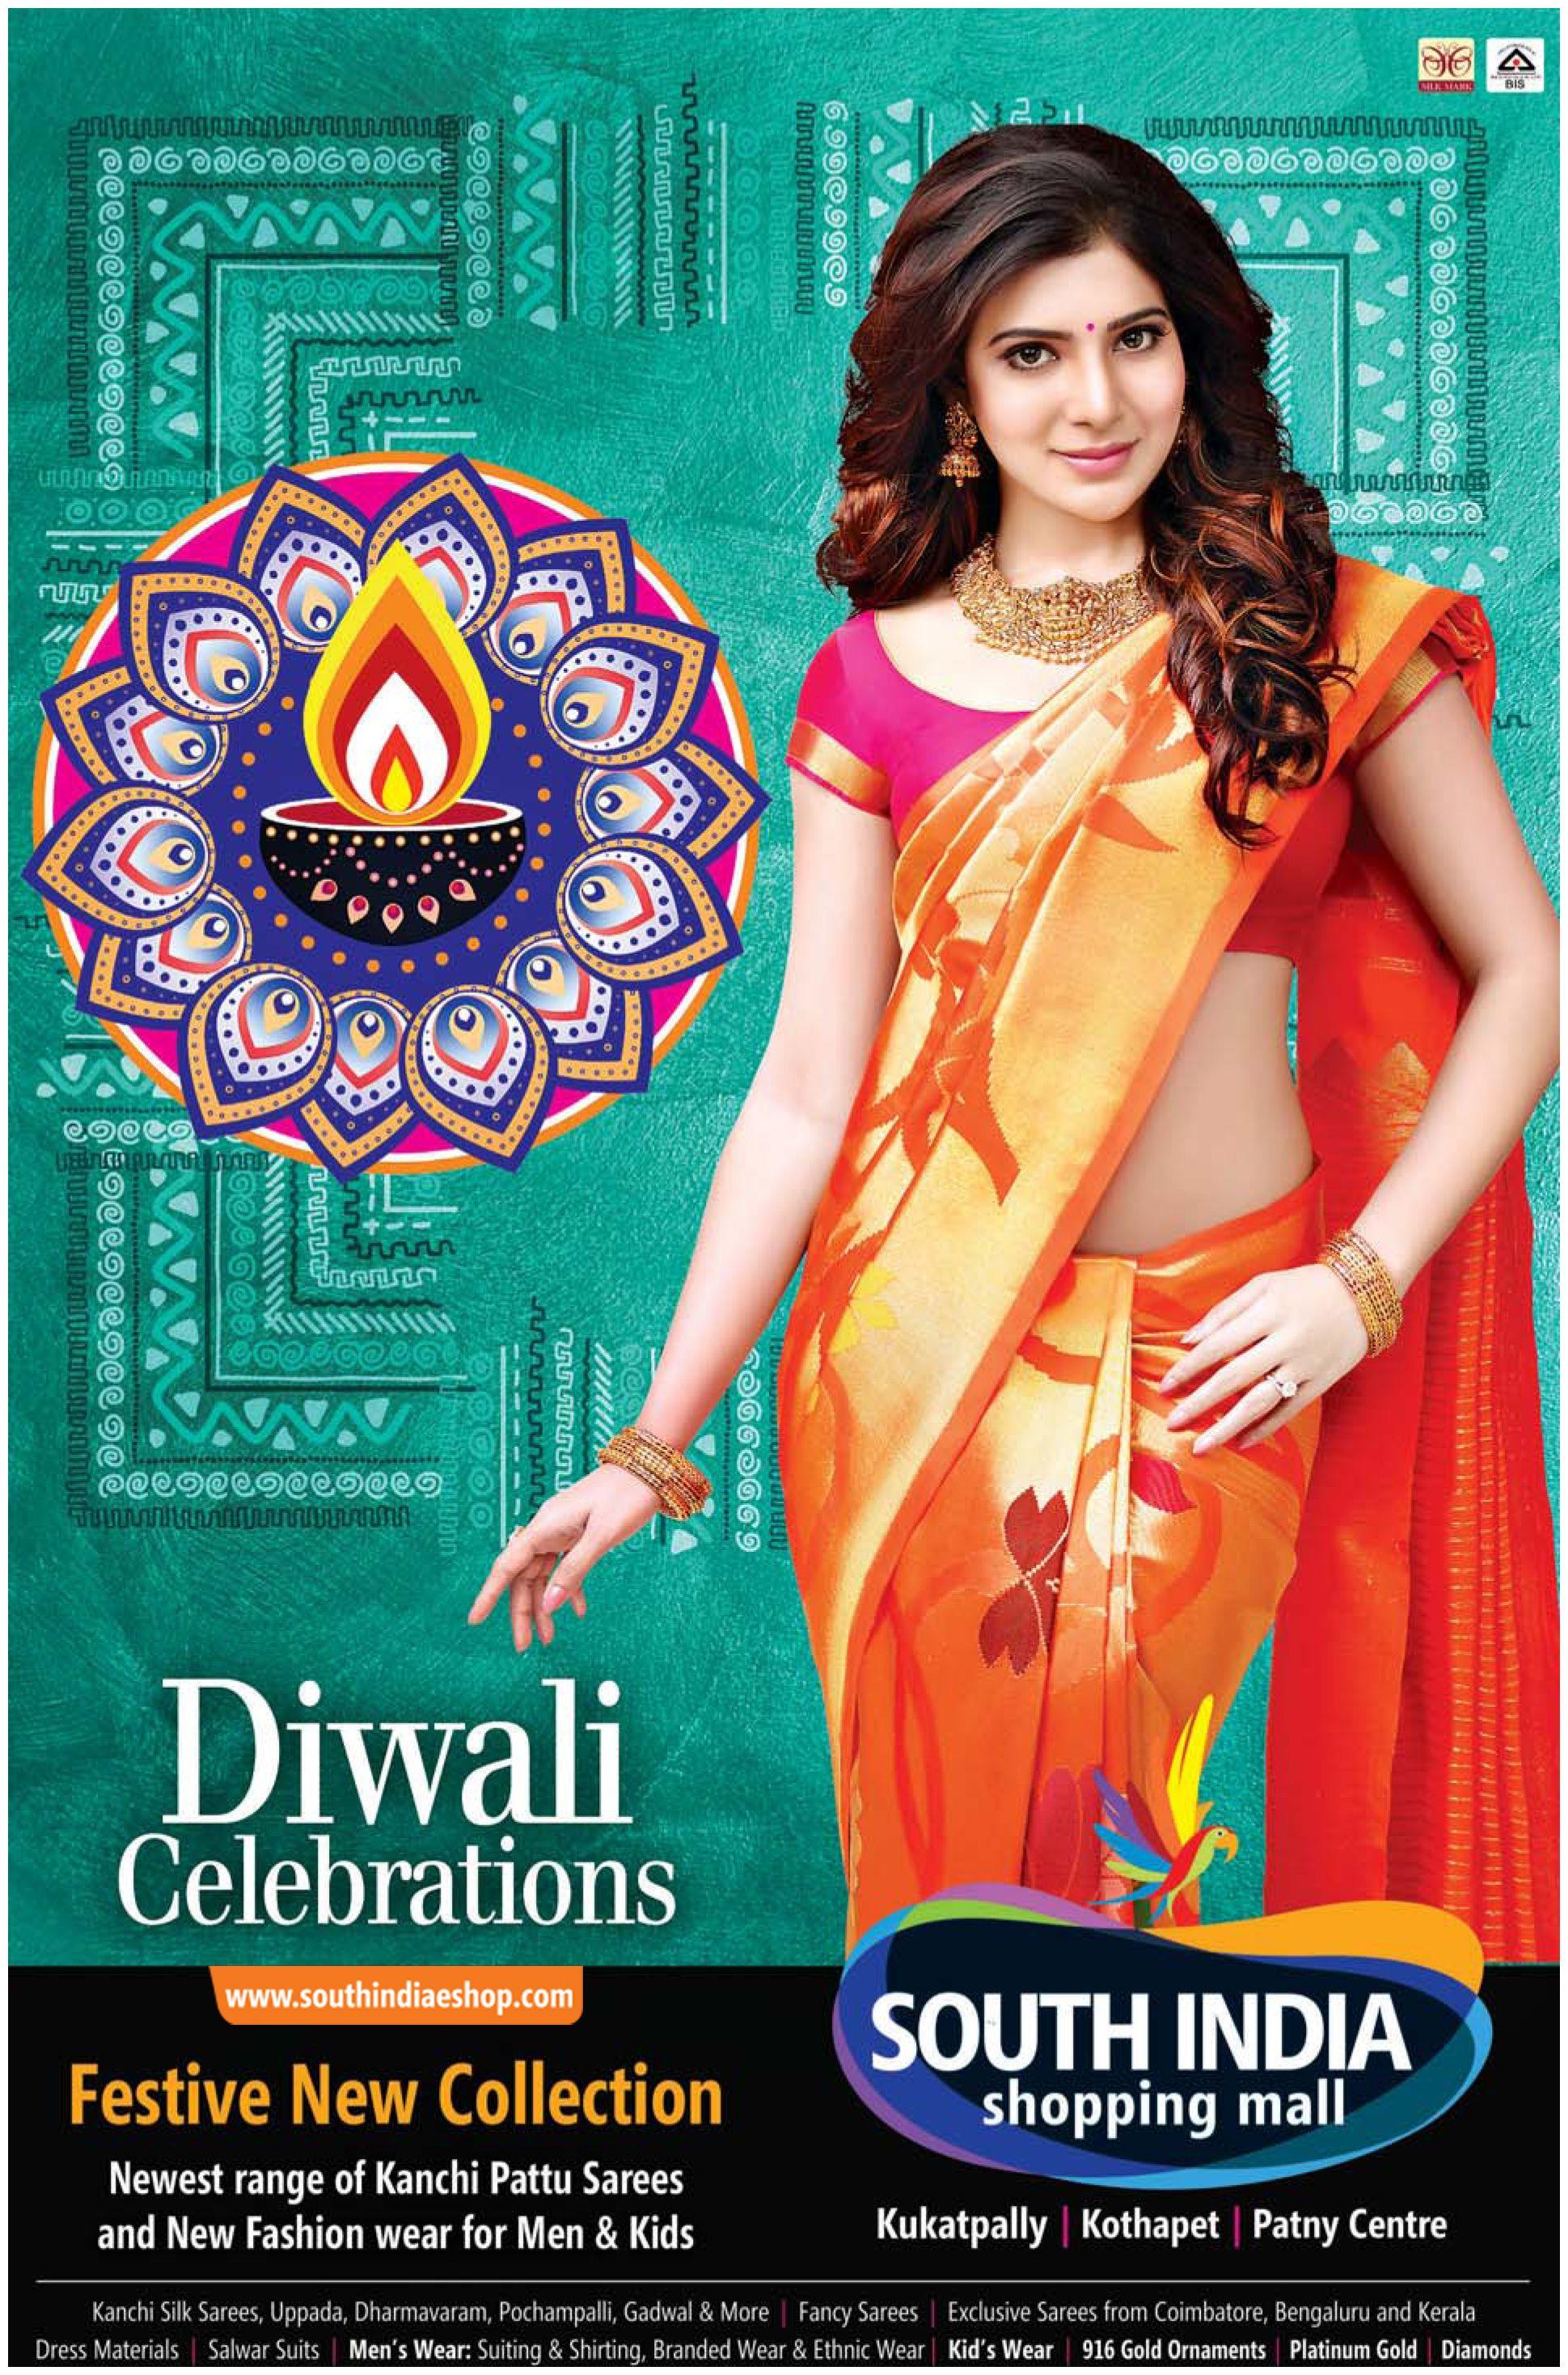 Diwali Celebrations Happening South India Shopping Mall